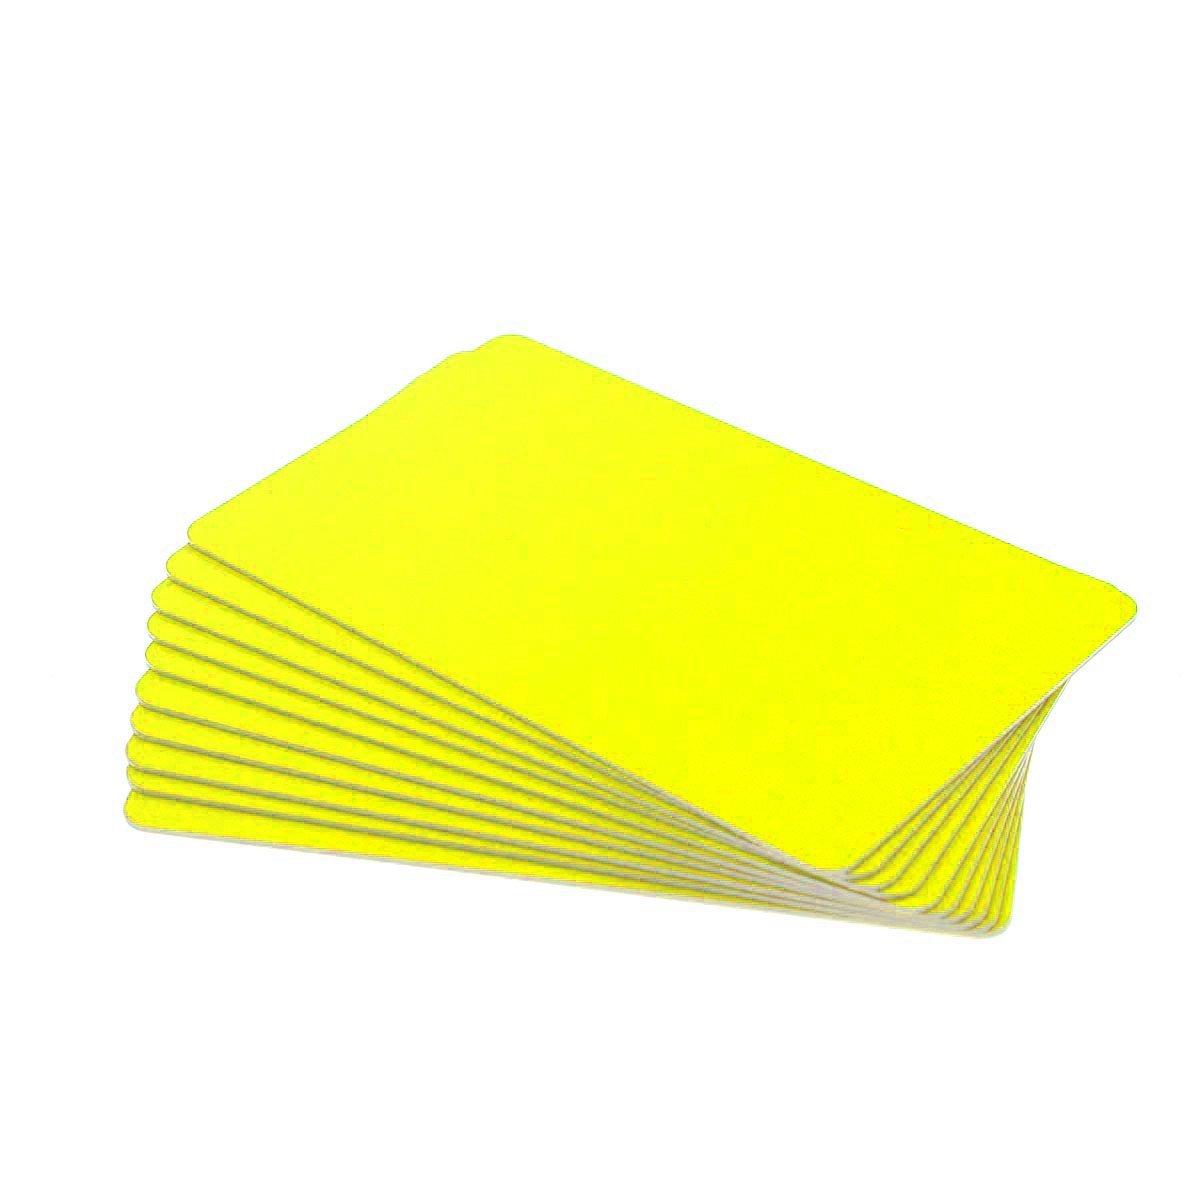 Karten, Zebra Premier Colour PVC, gelb, 30 mil